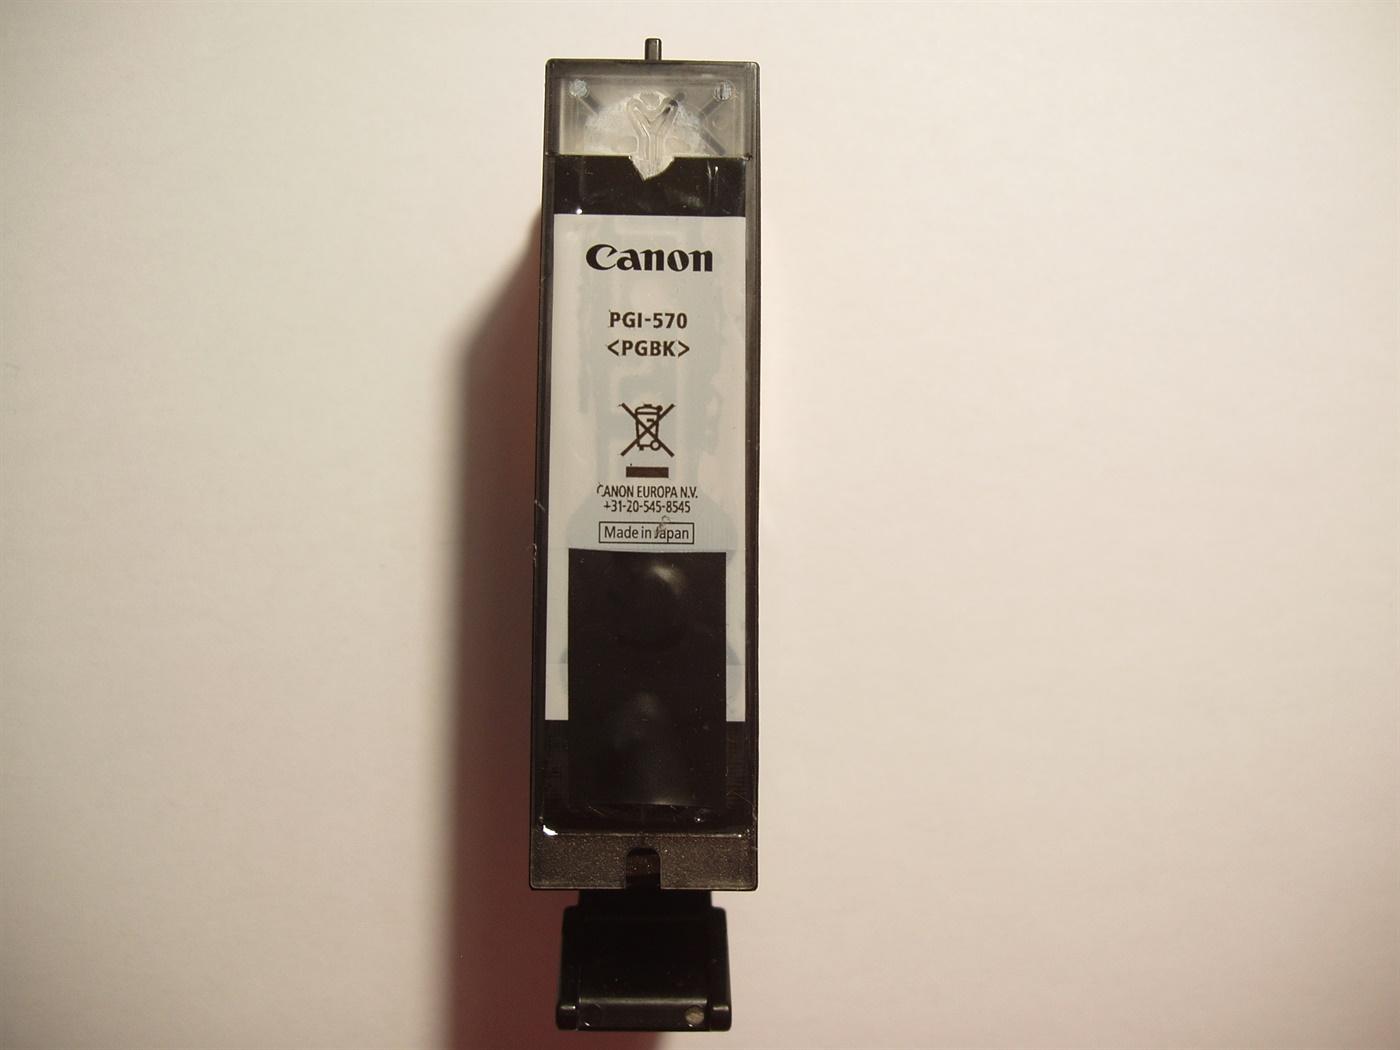 CANON PGI-570 black